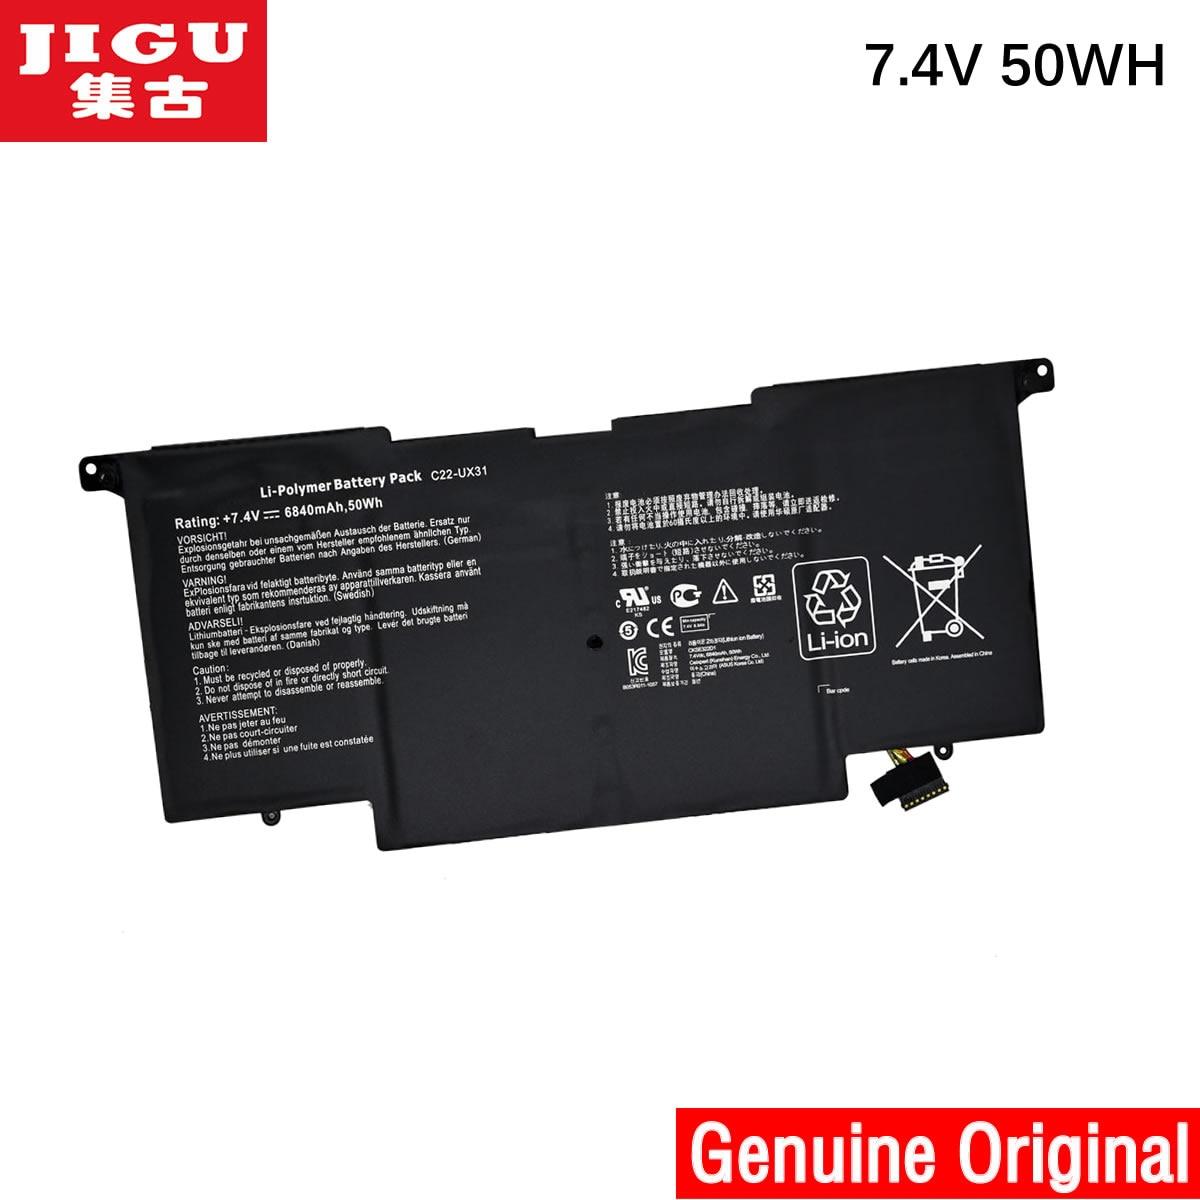 JIGU C22-UX31 C23-UX31 Original laptop Battery For Asus Ultrabook ZENBOOK UX31 UX31A UX31E 7.4V 6840MAH 50WH